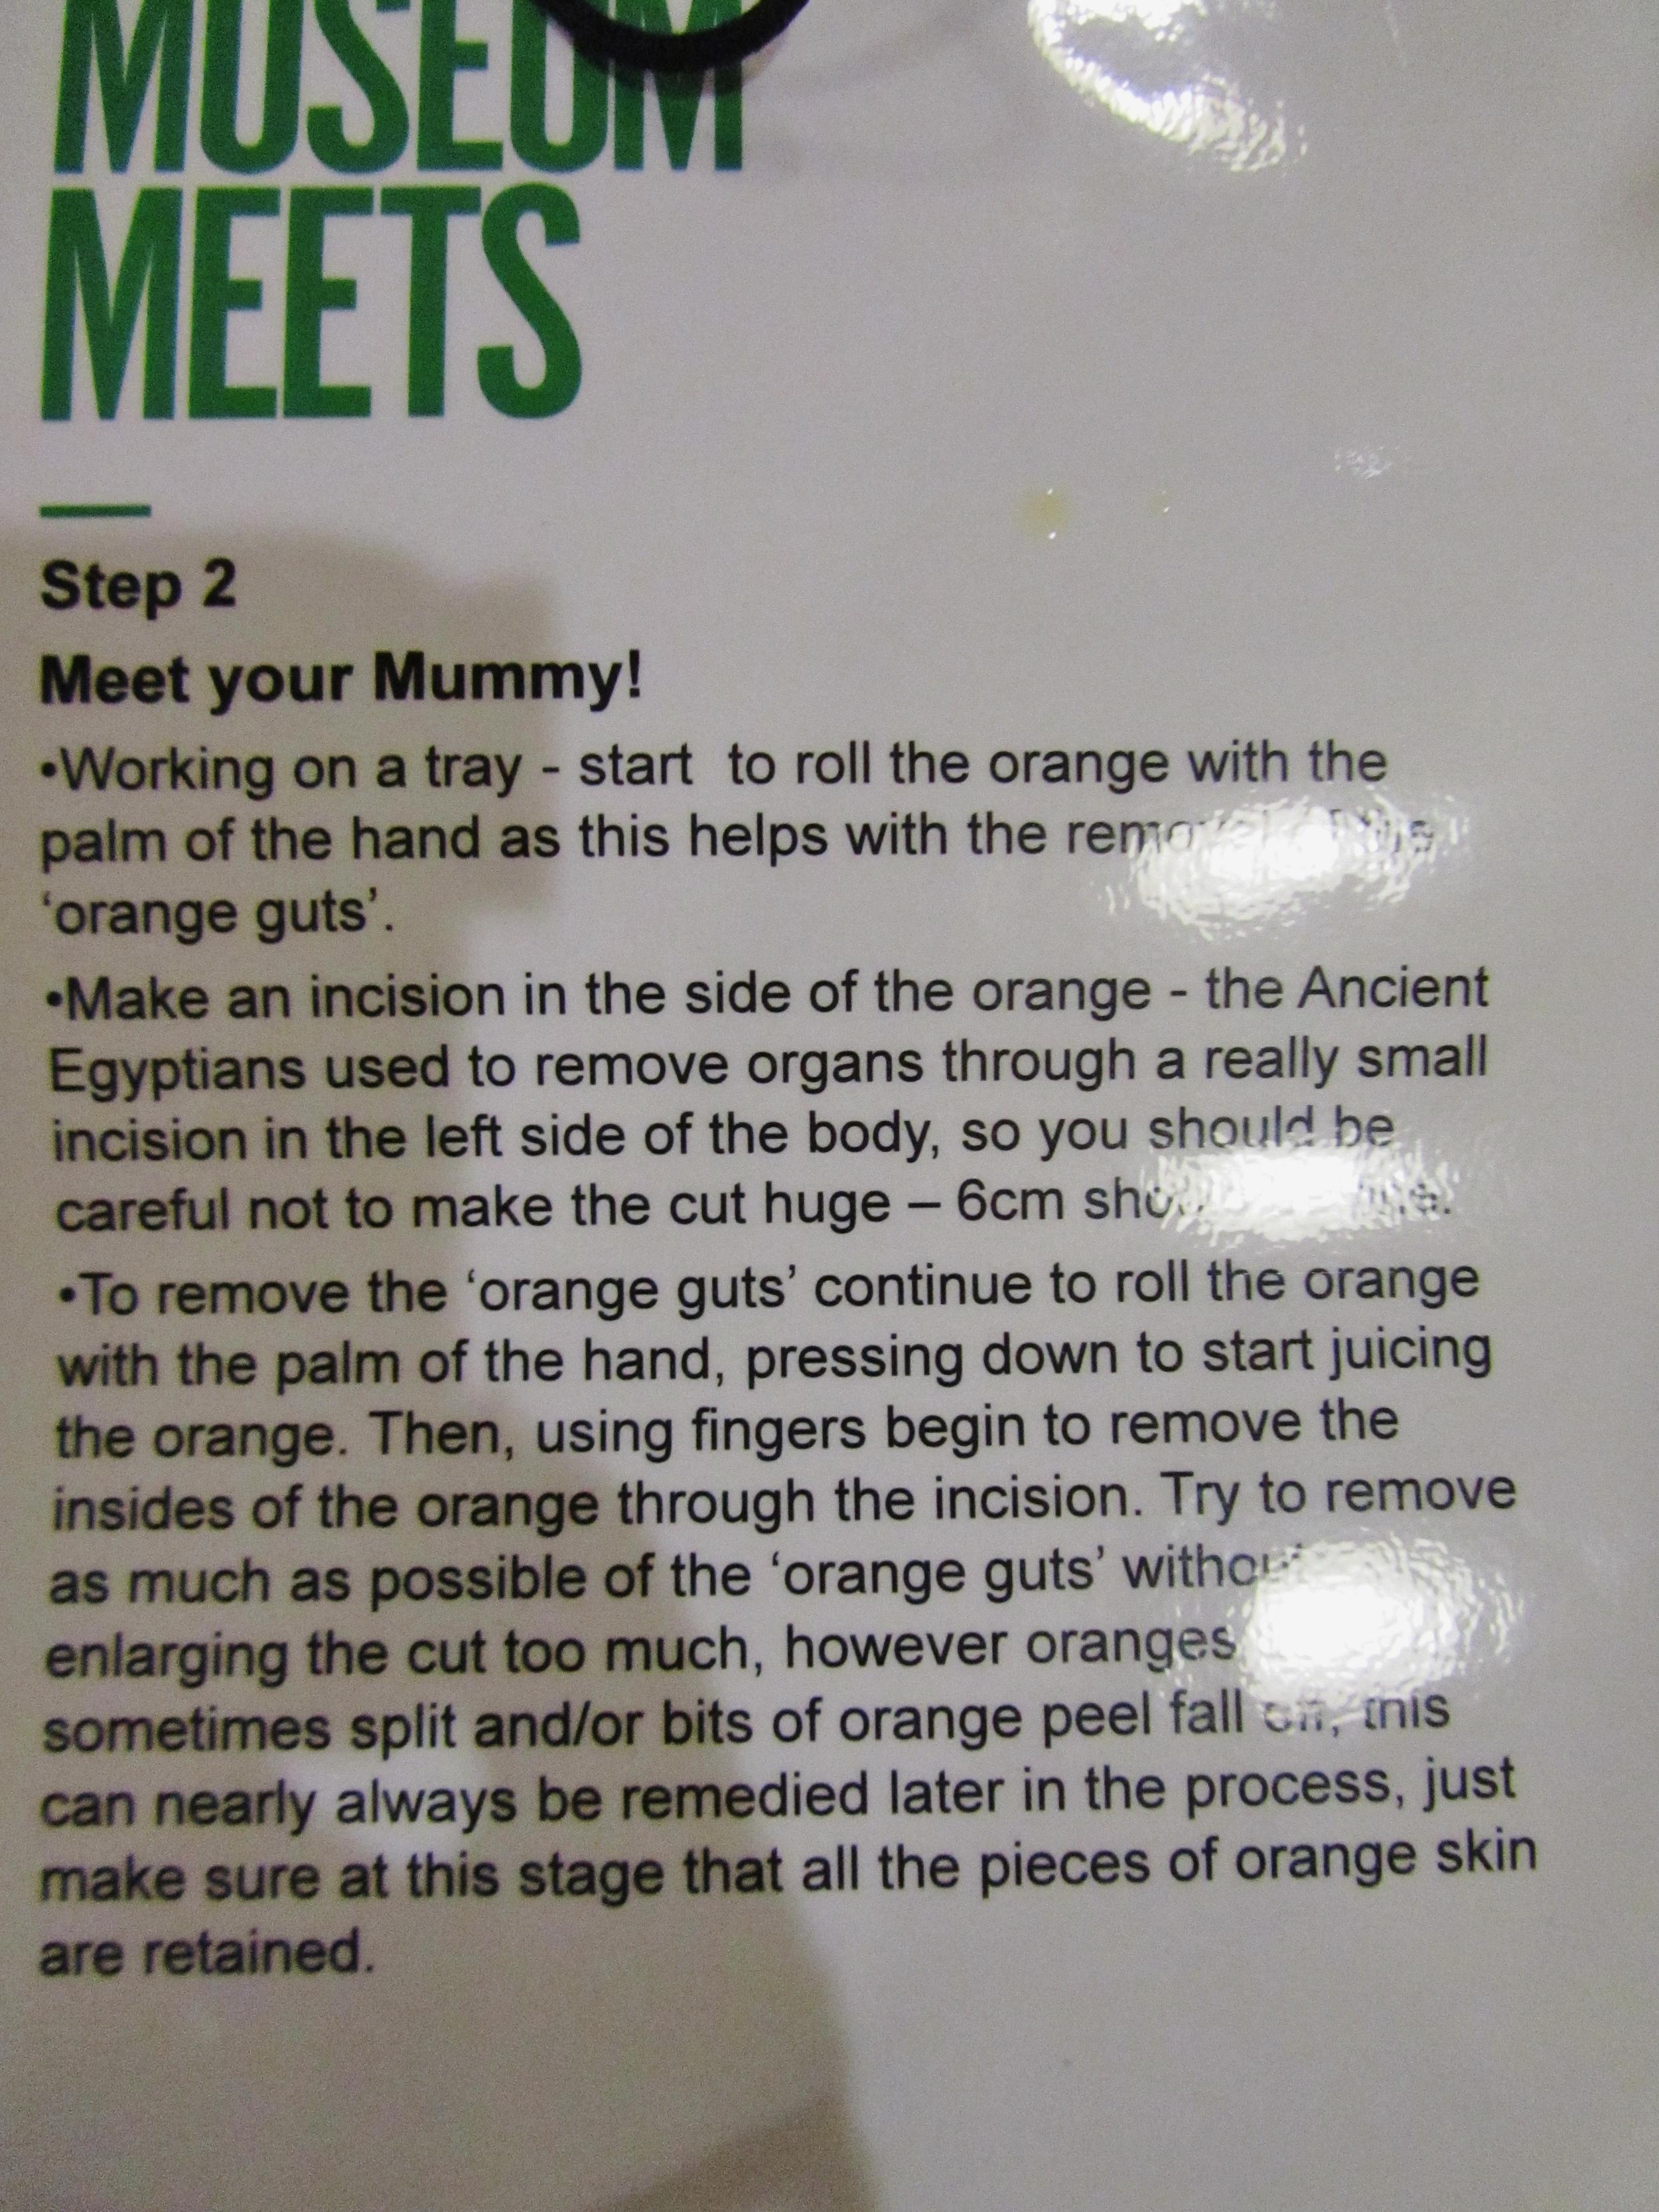 after hours step 2 manchester museum mummifying orange meet your mummy.JPG